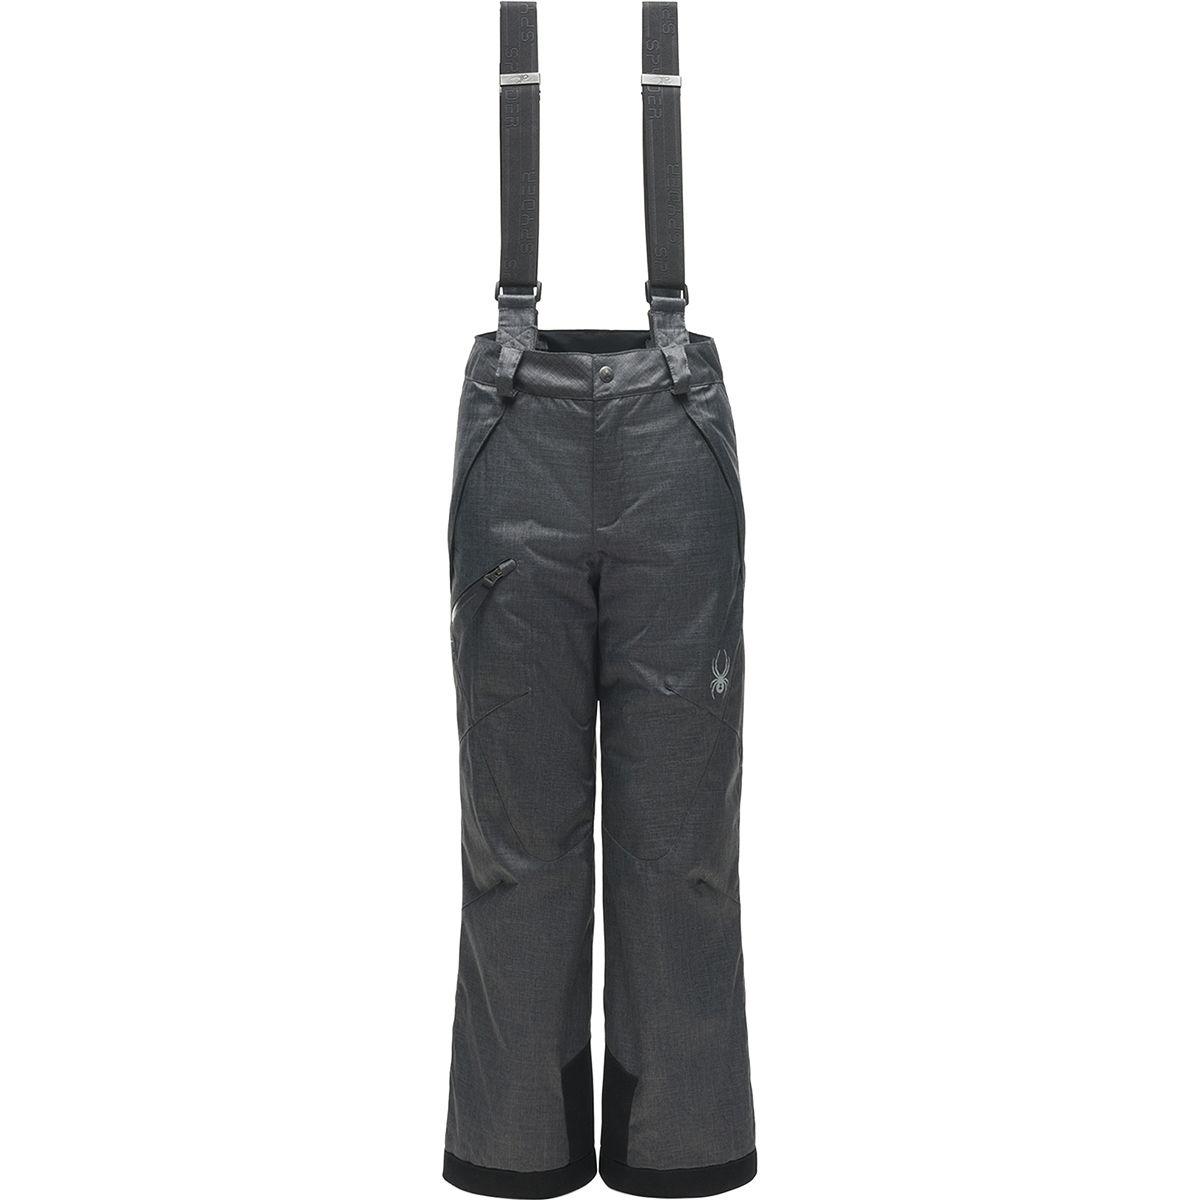 Spyder Propulsion Pant